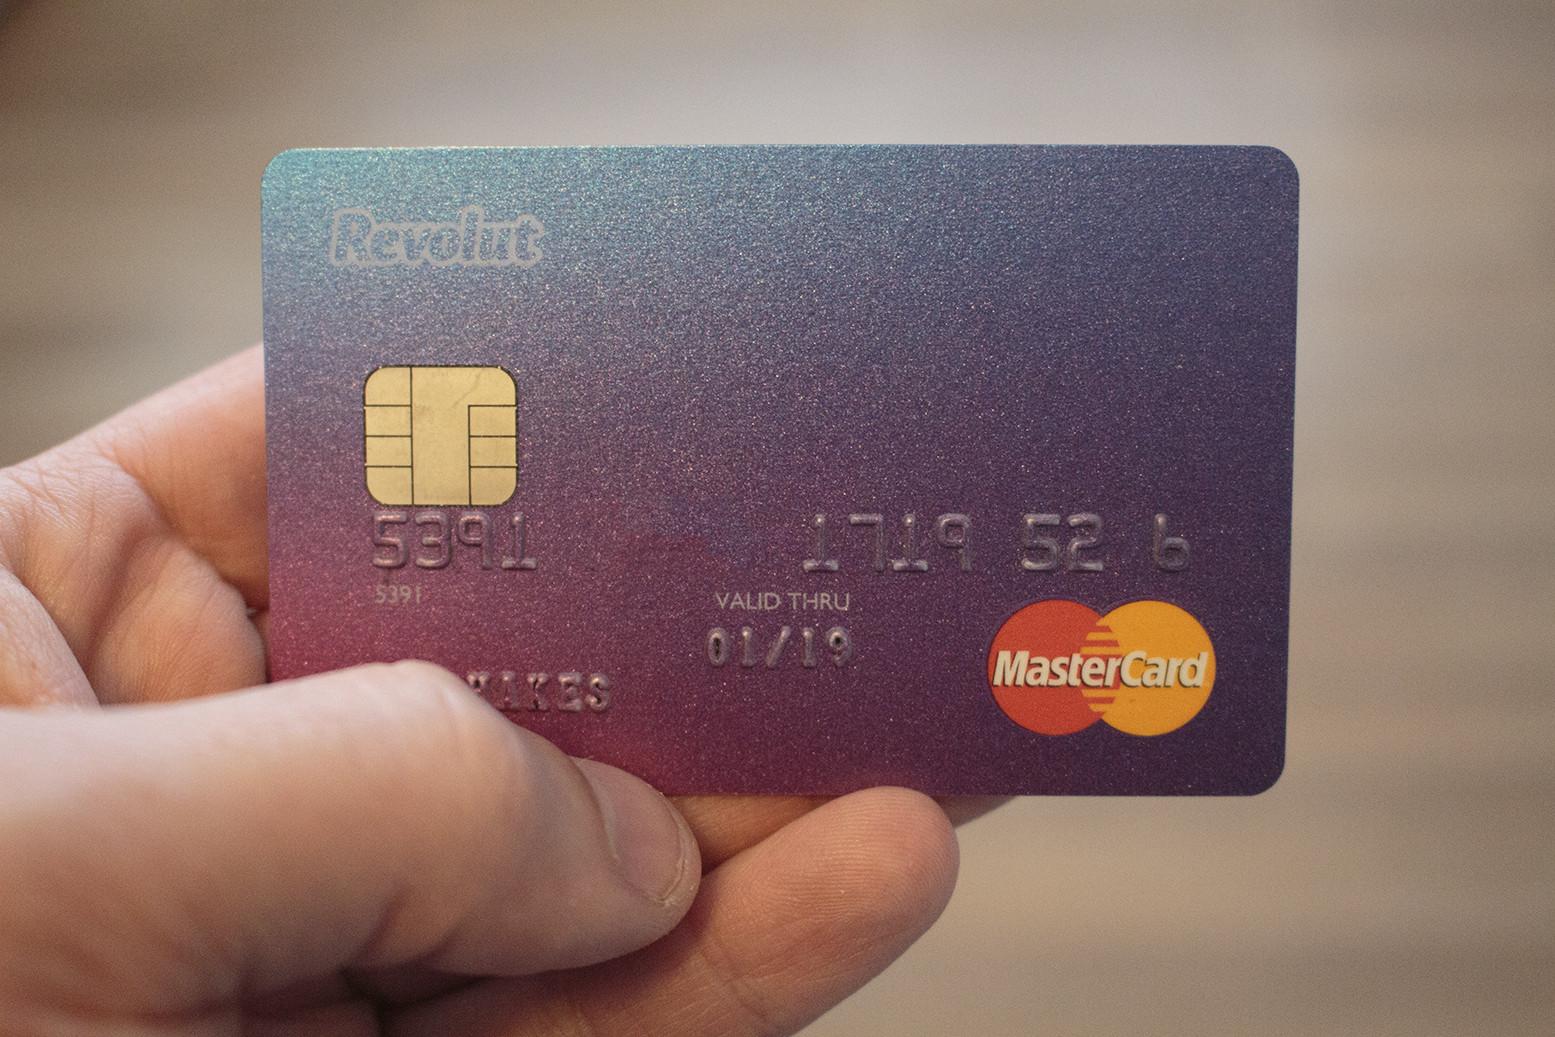 Revolut Card